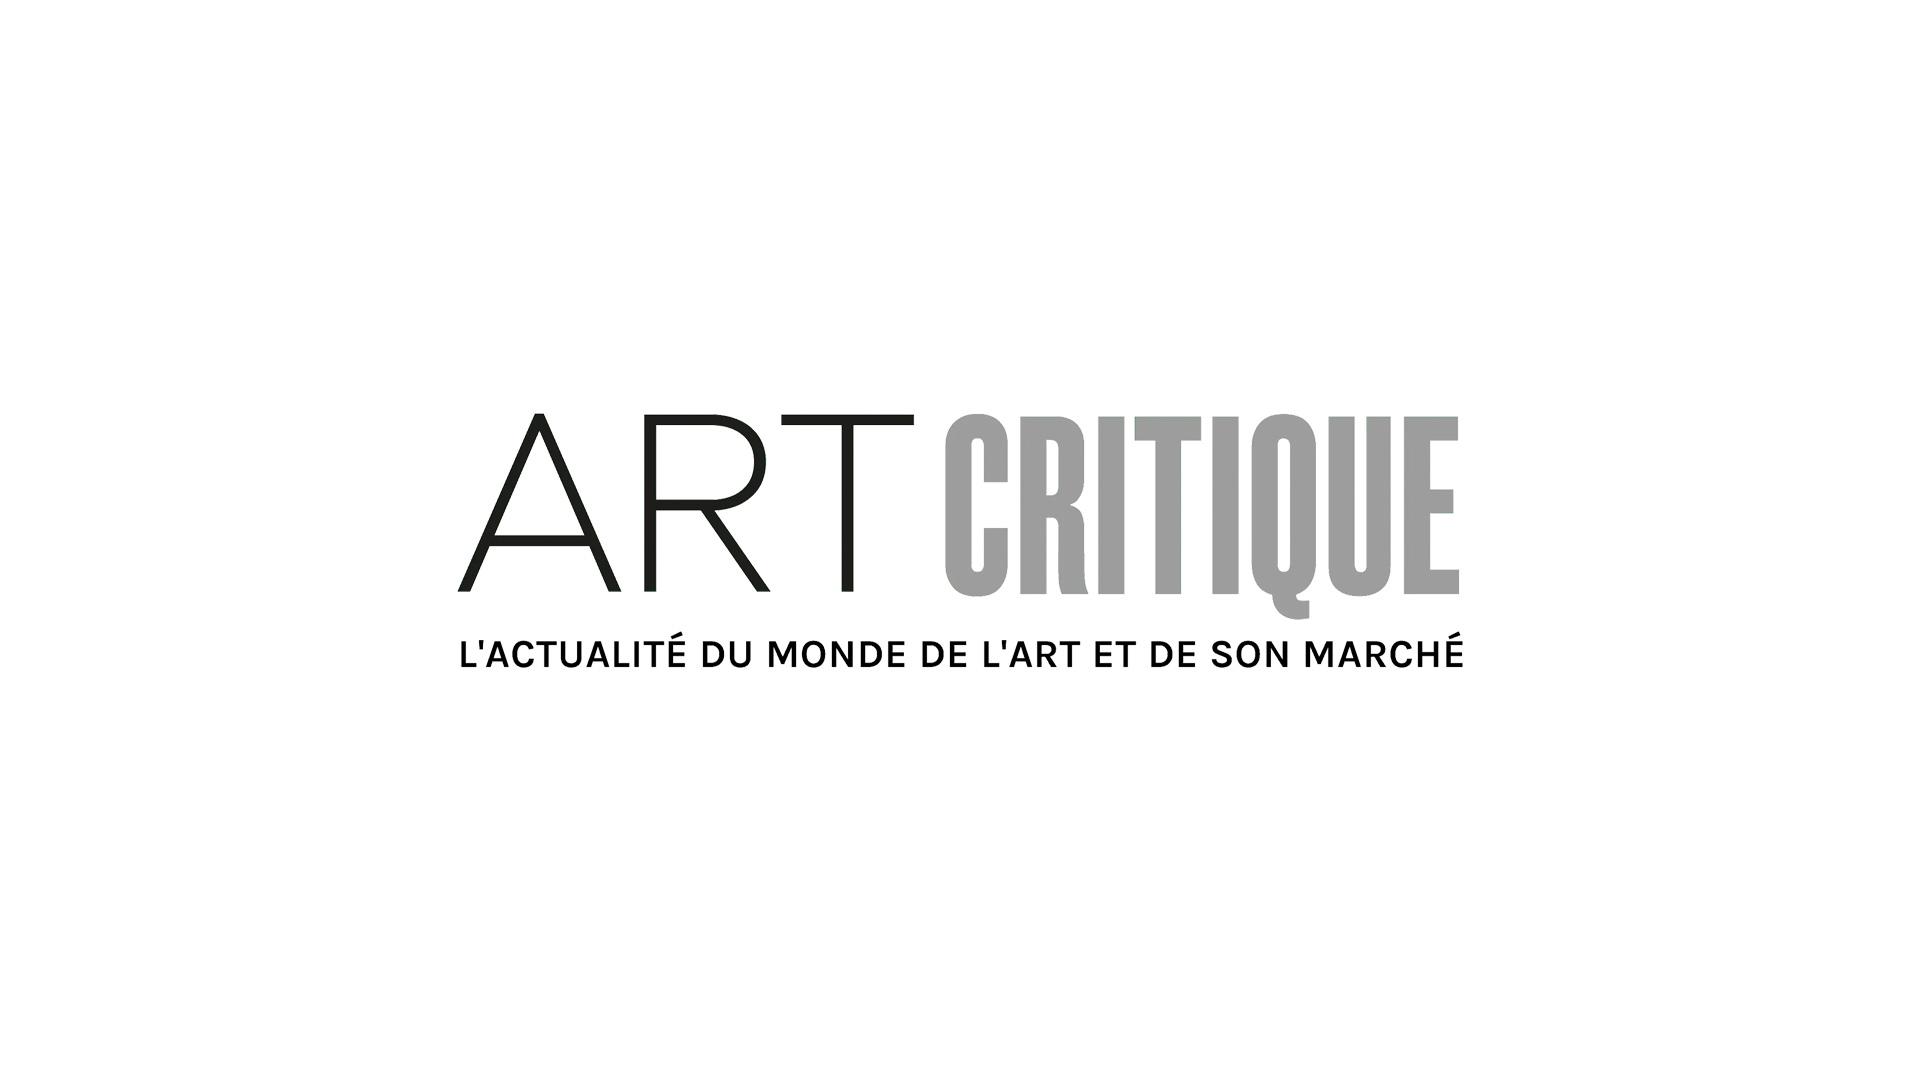 Poetic visions in Paris during La Nuit Blanche 2018